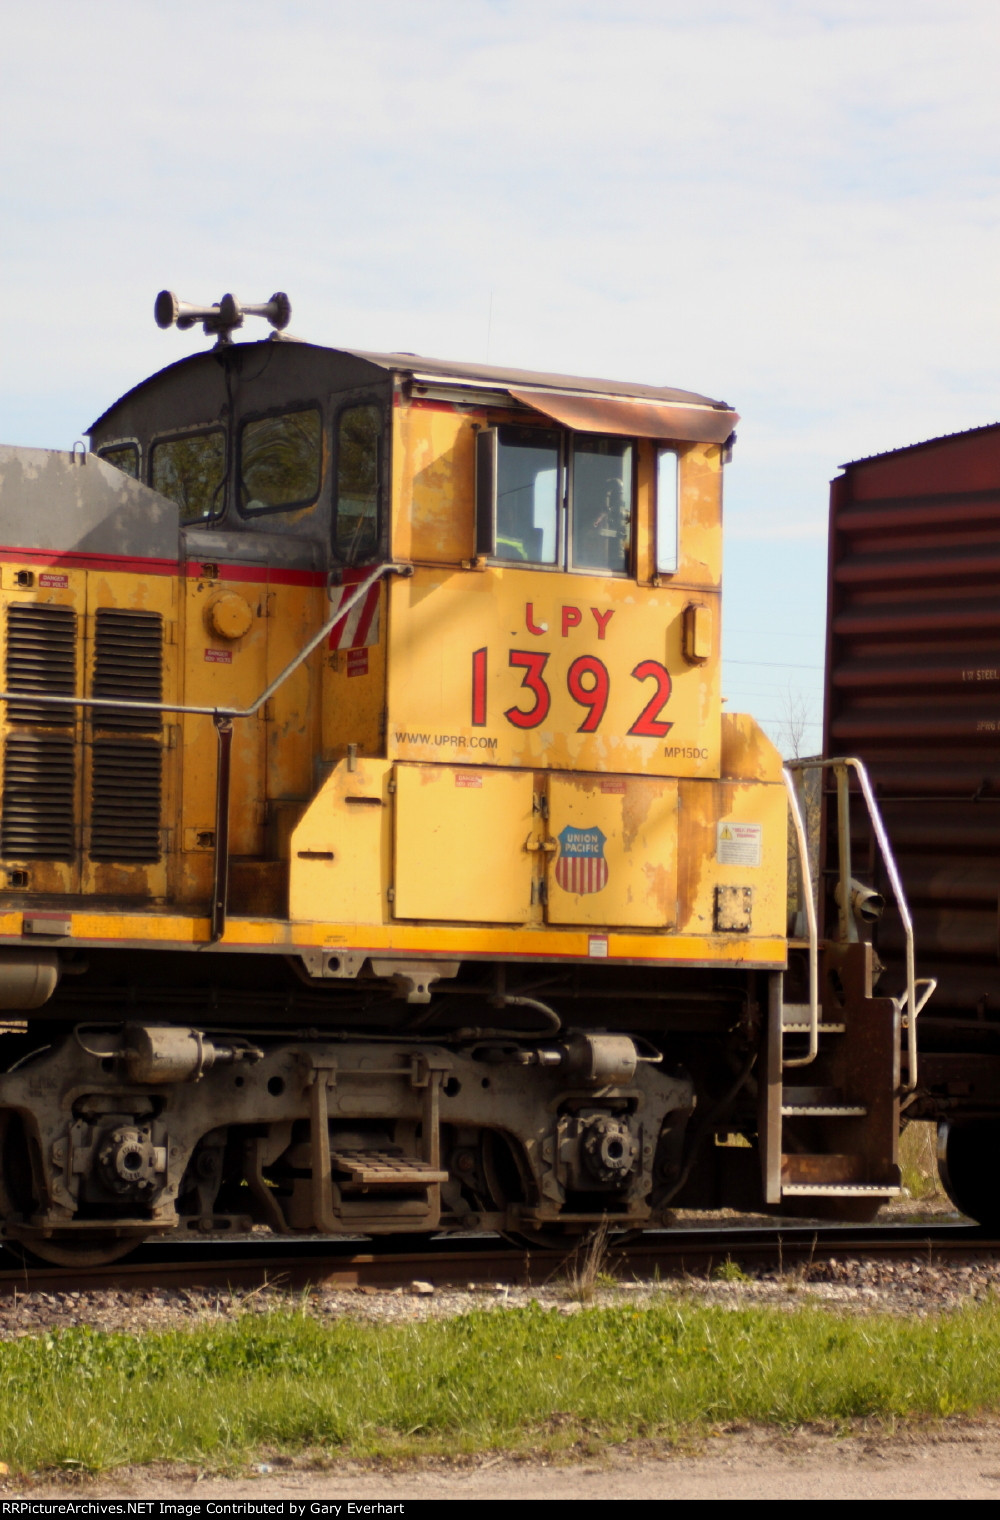 UPY 1392 - Union Pacific